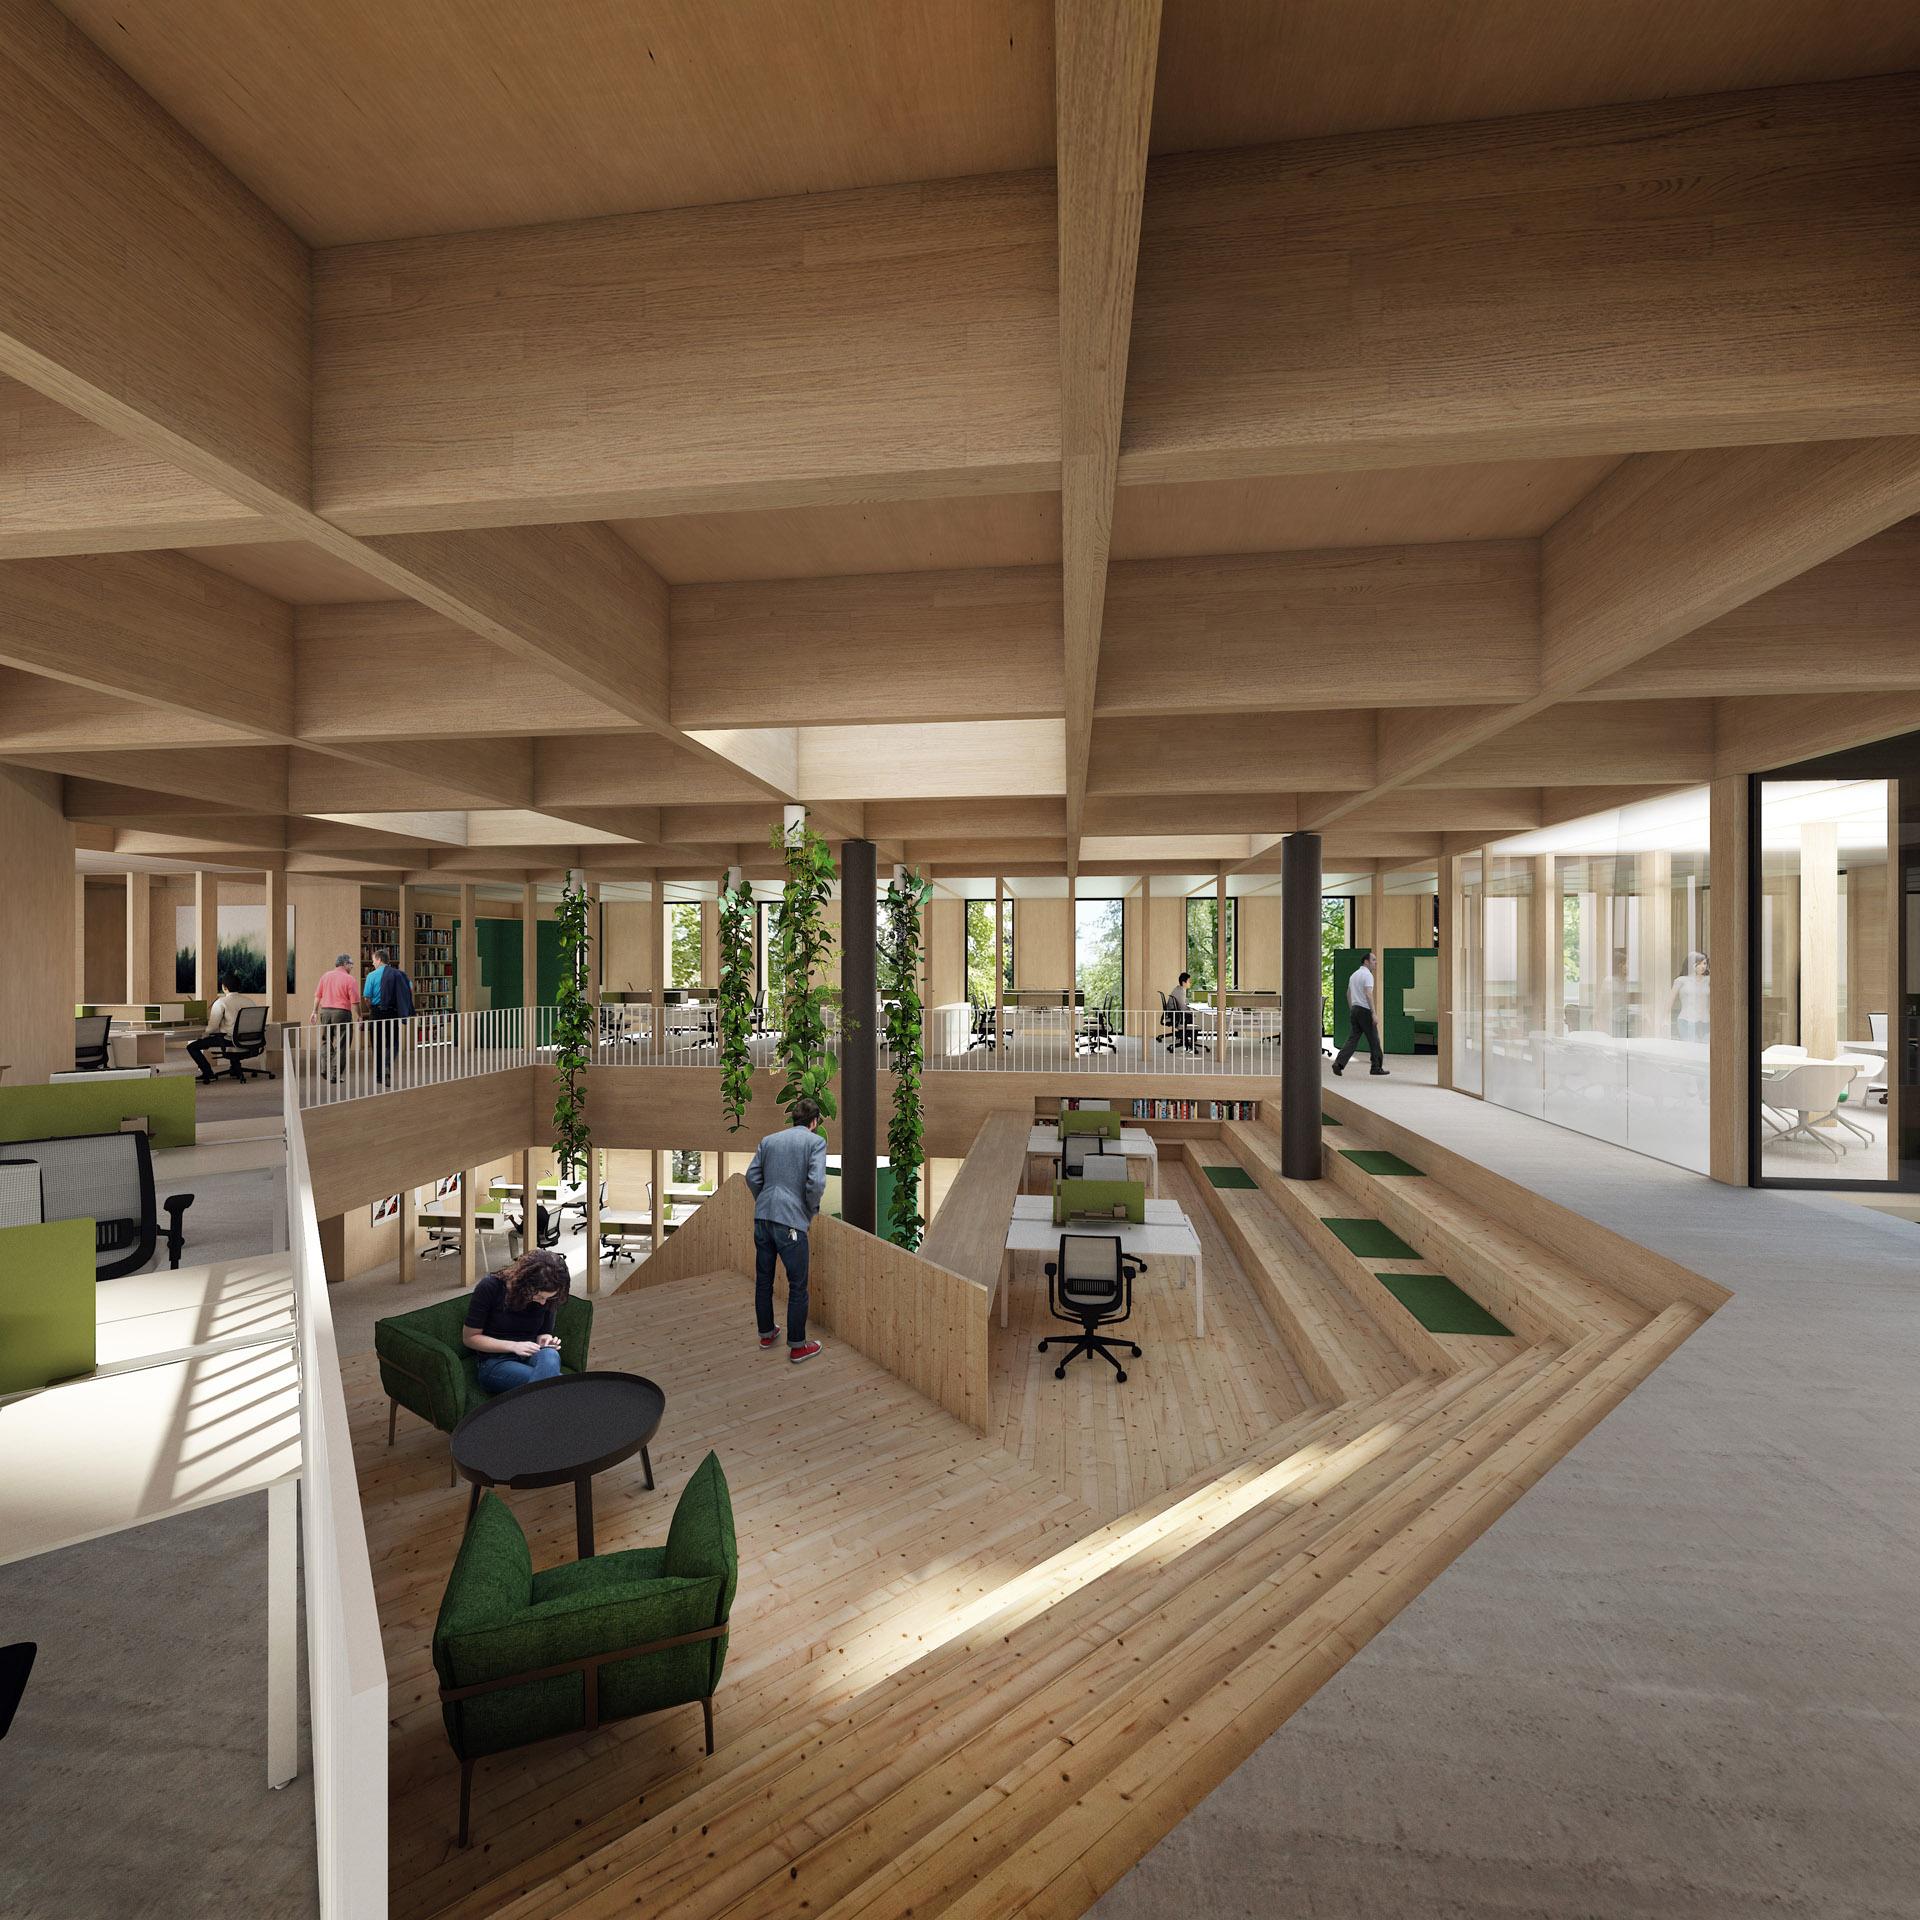 Chybik+Kristof Architects & Urban Designers_LesyCR_chybik_kristof_lcr_10